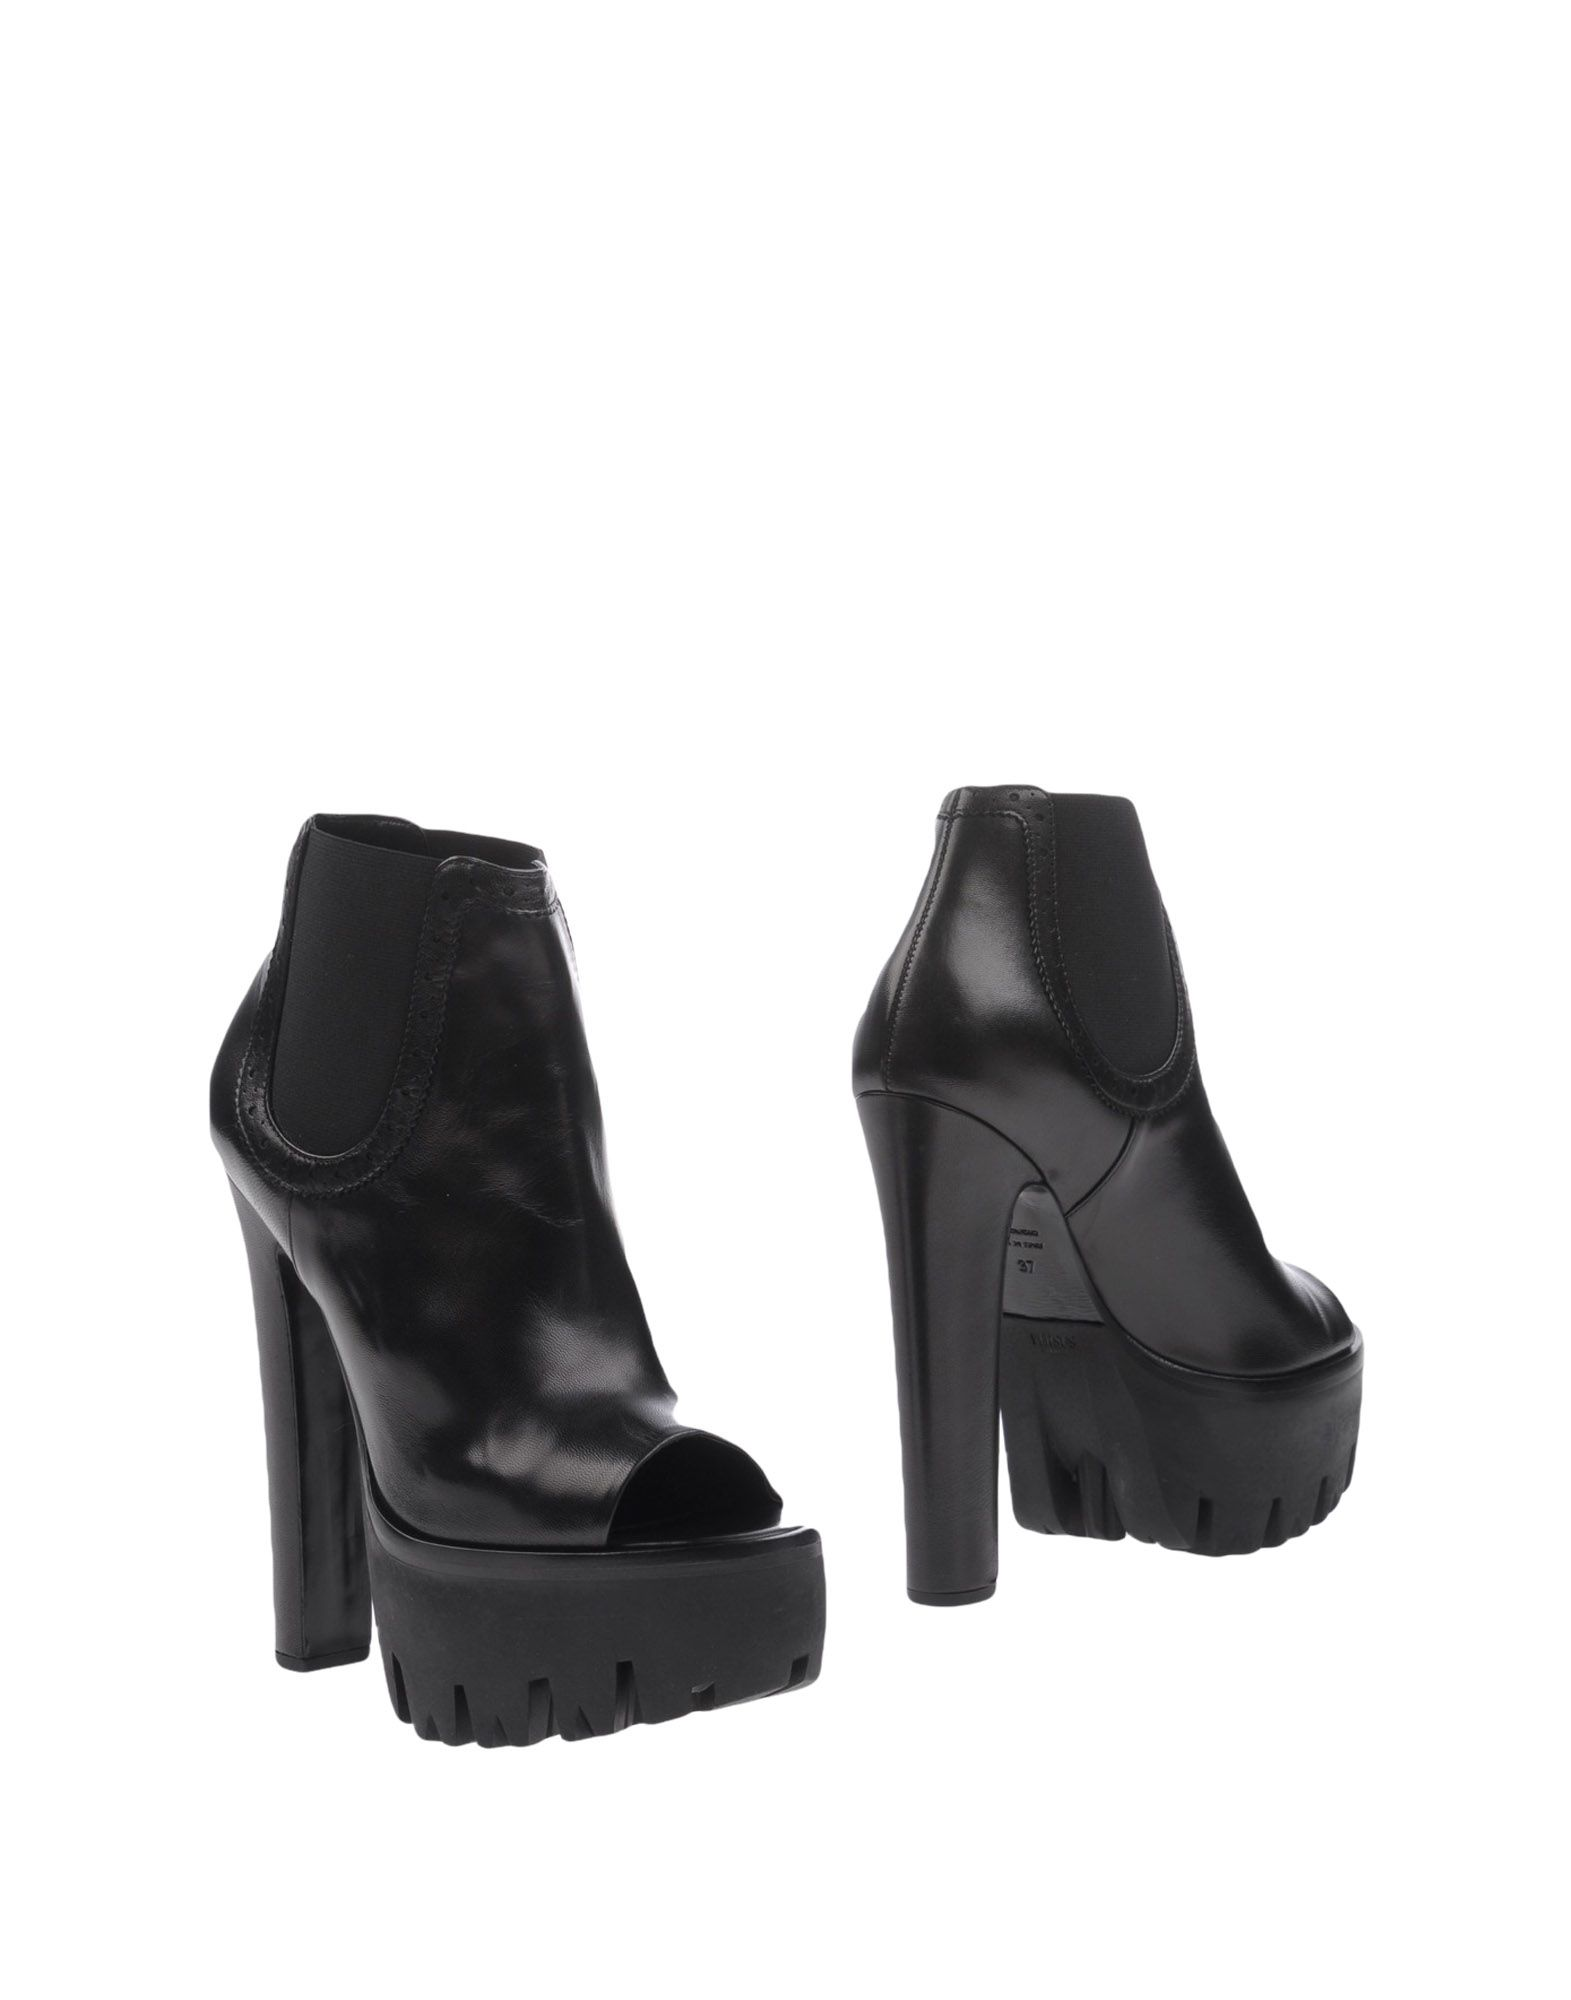 Versus Versace Ankle Boot - Women Versus Versace Ankle Boots - online on  Australia - Boots 11221360EJ 73a08a